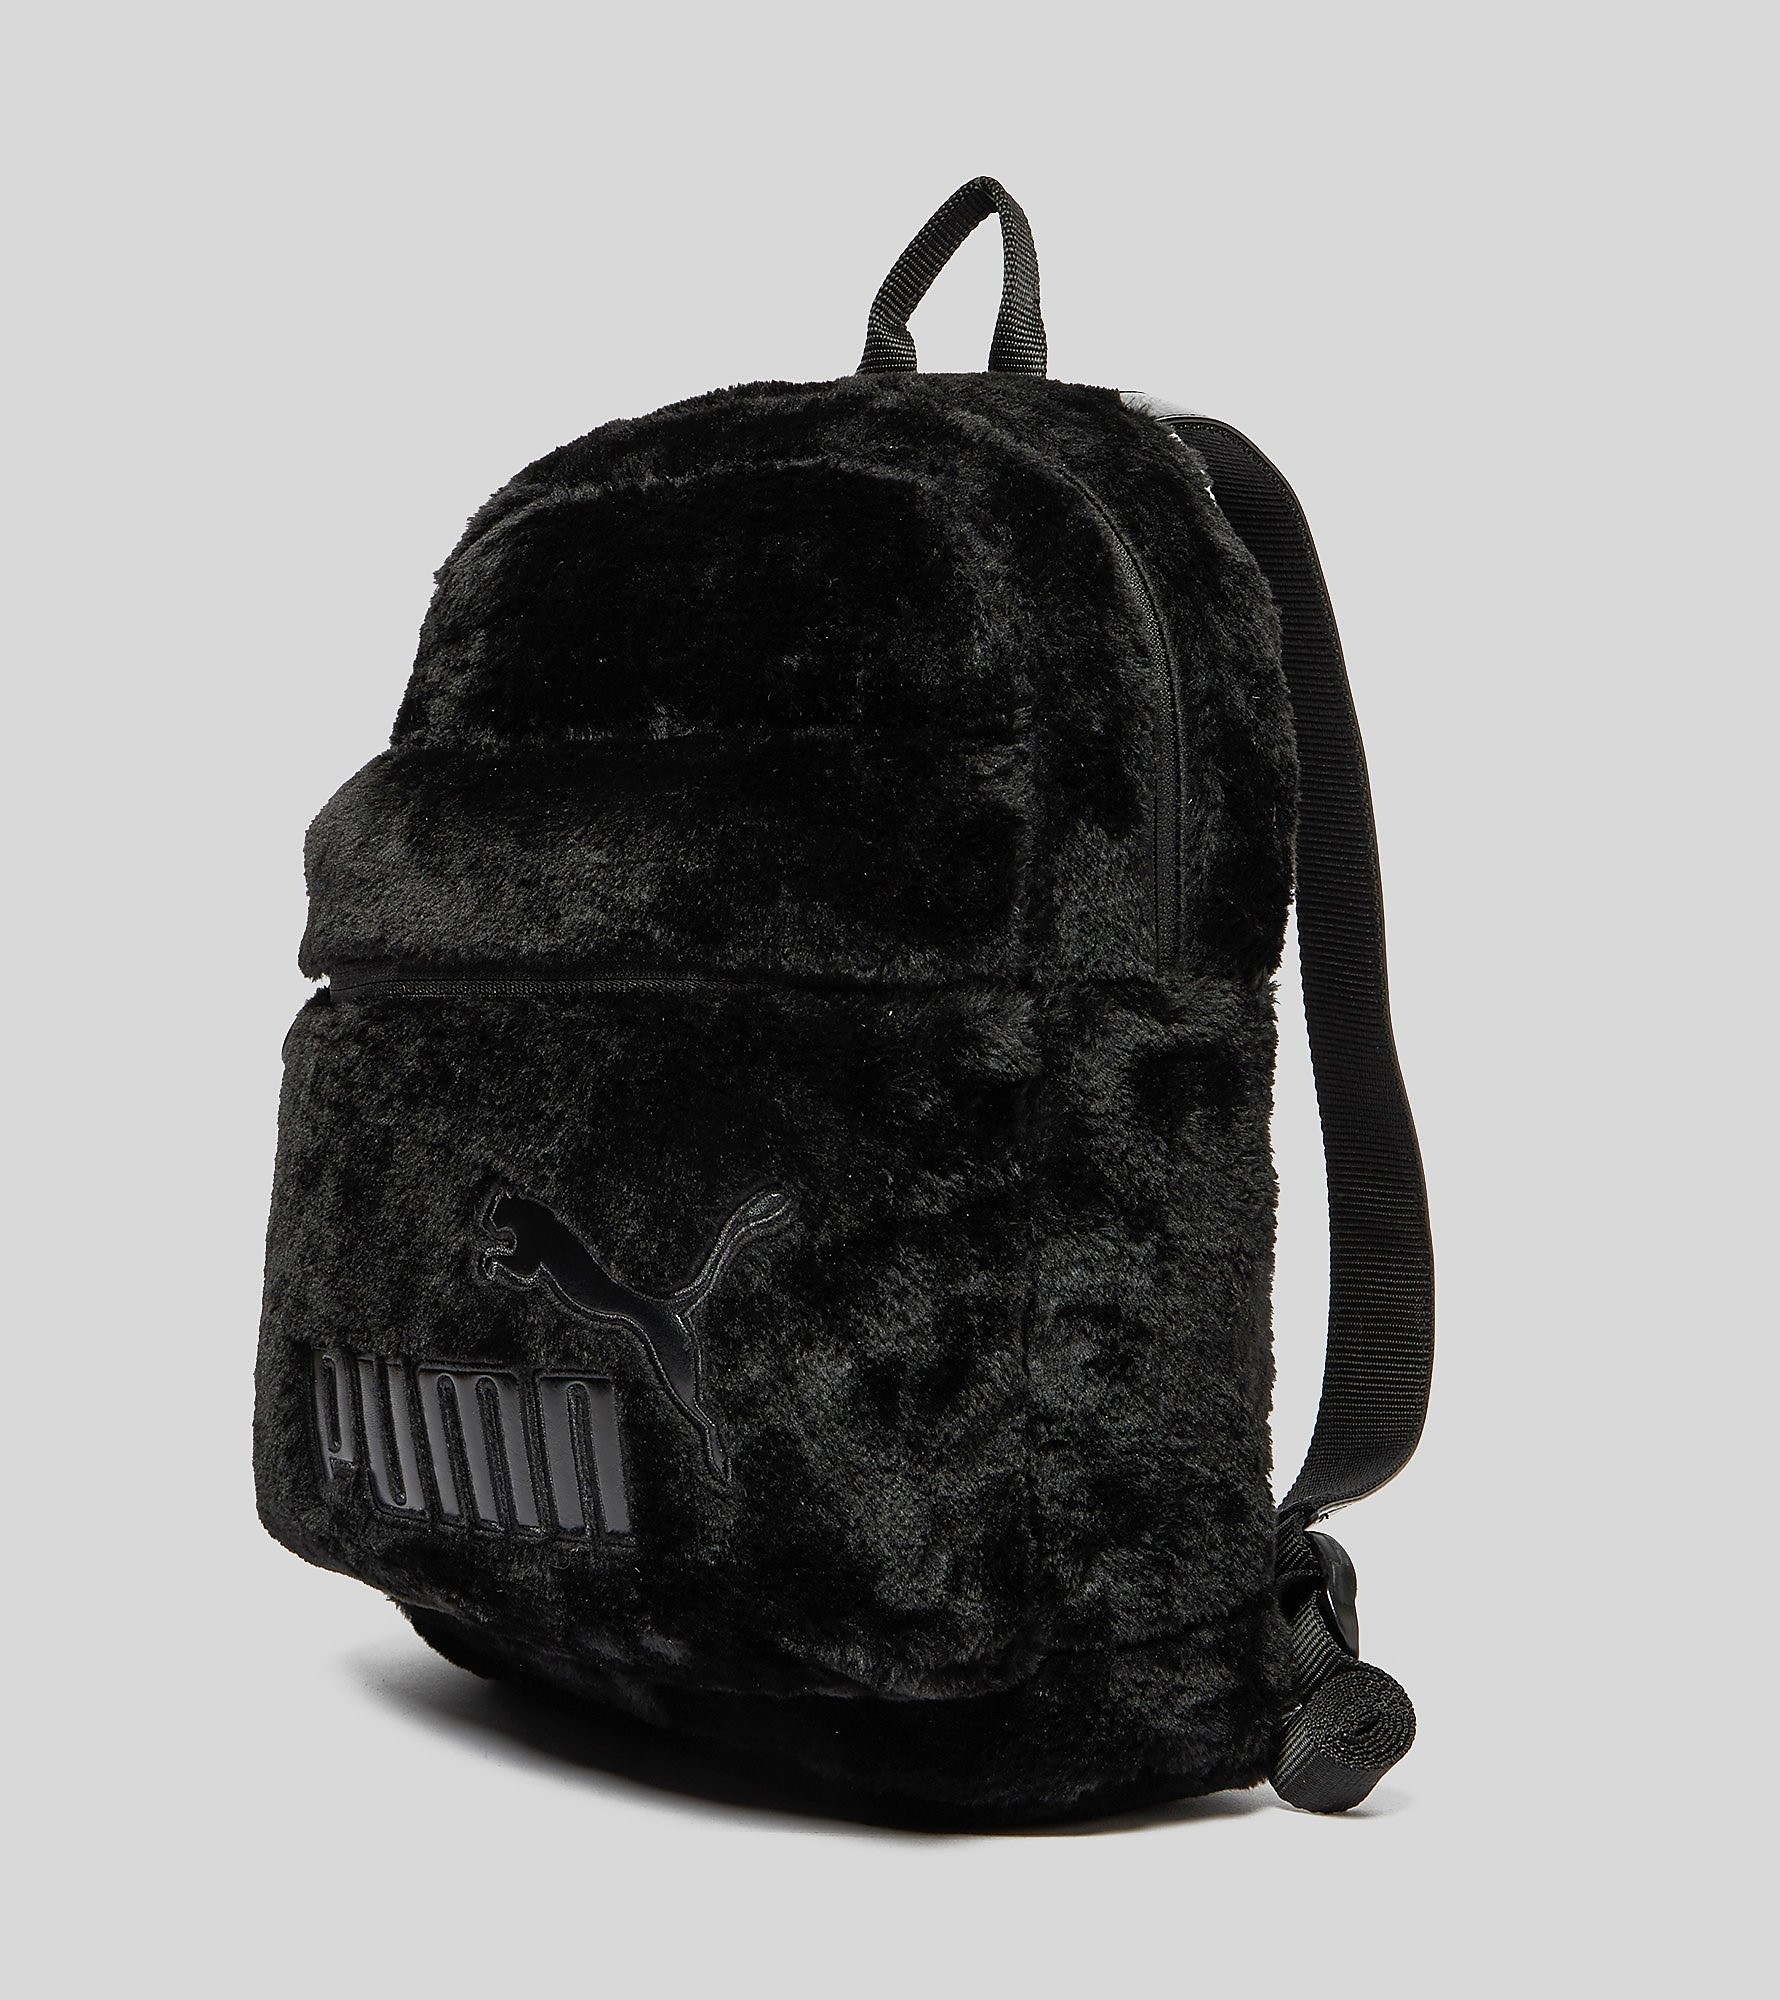 PUMA Mascot Bear Backpack, Zwart